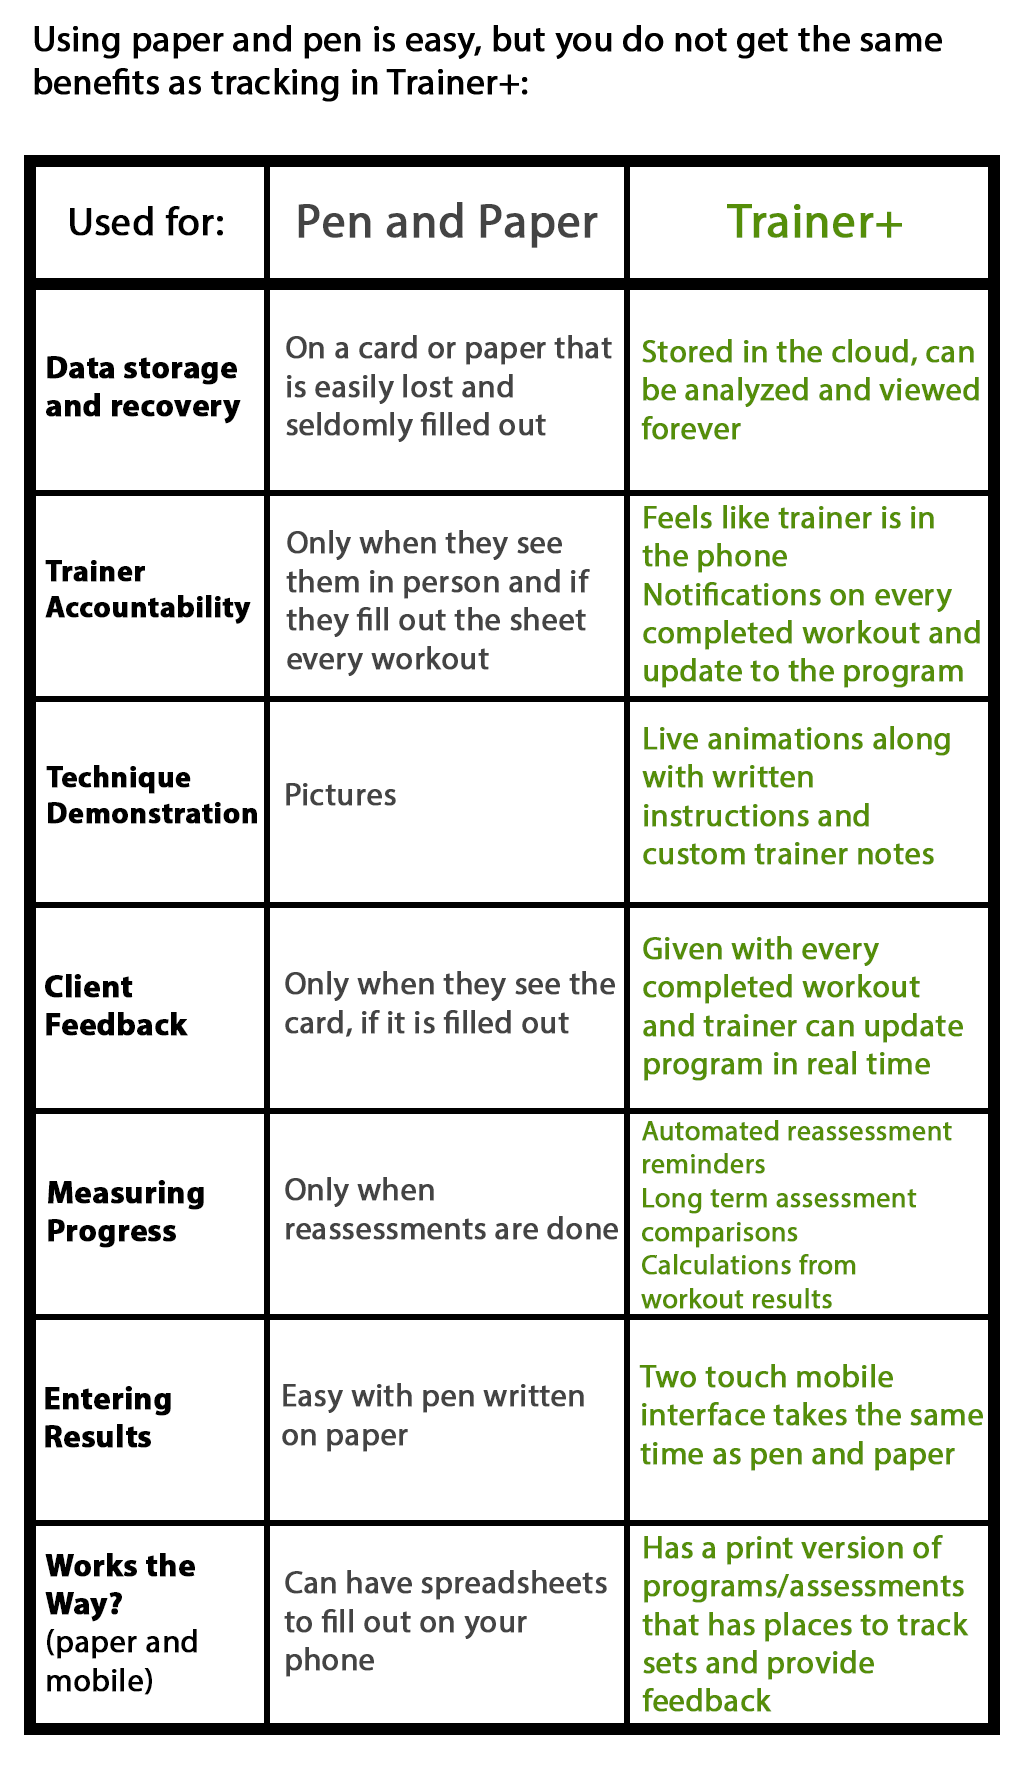 Why comparison charts - pen.png